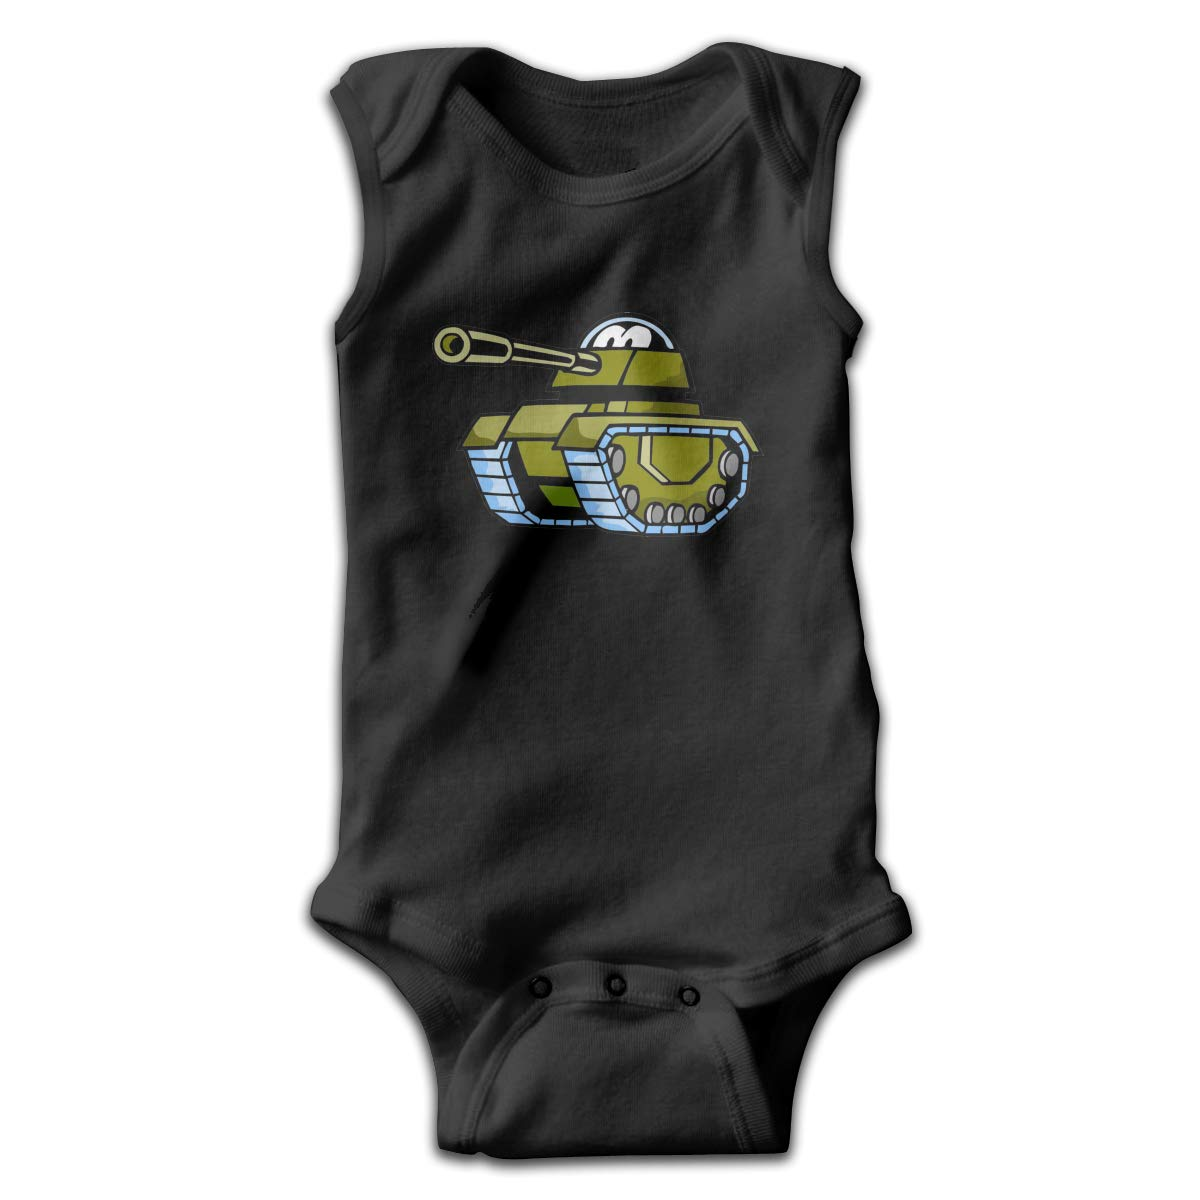 Dunpaiaa Cartoon Tank Newborn Crawling Suit Sleeveless Romper Bodysuit Onesies Jumpsuit Black